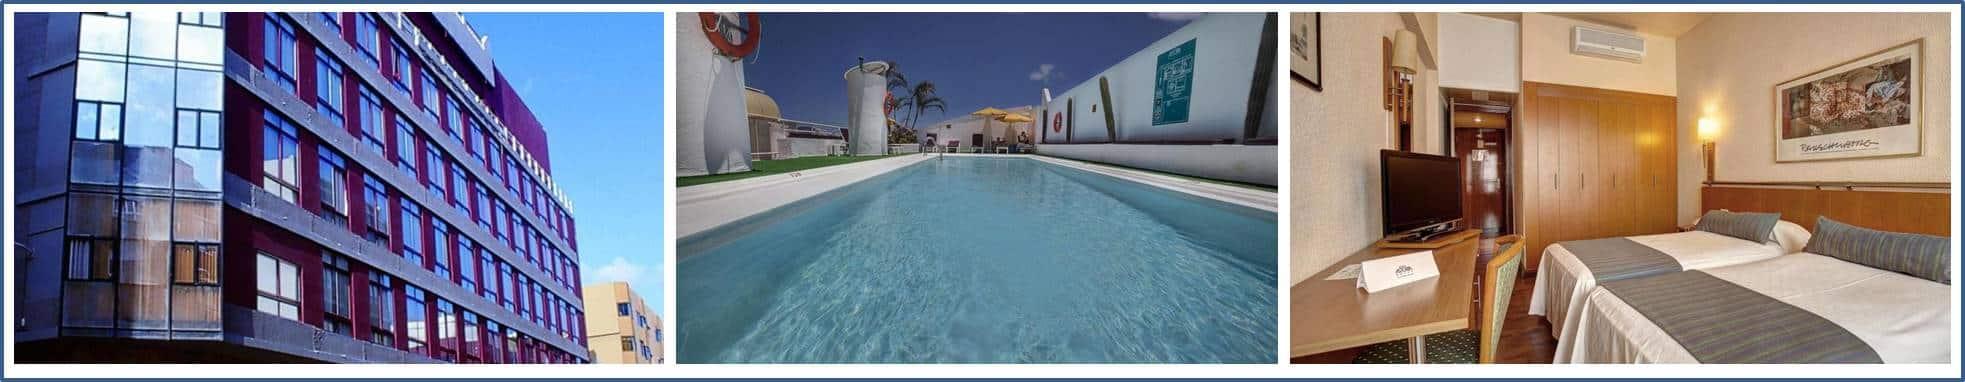 Kanarska Ostrva Letovanje 2019 - SALVADOR TRAVEL